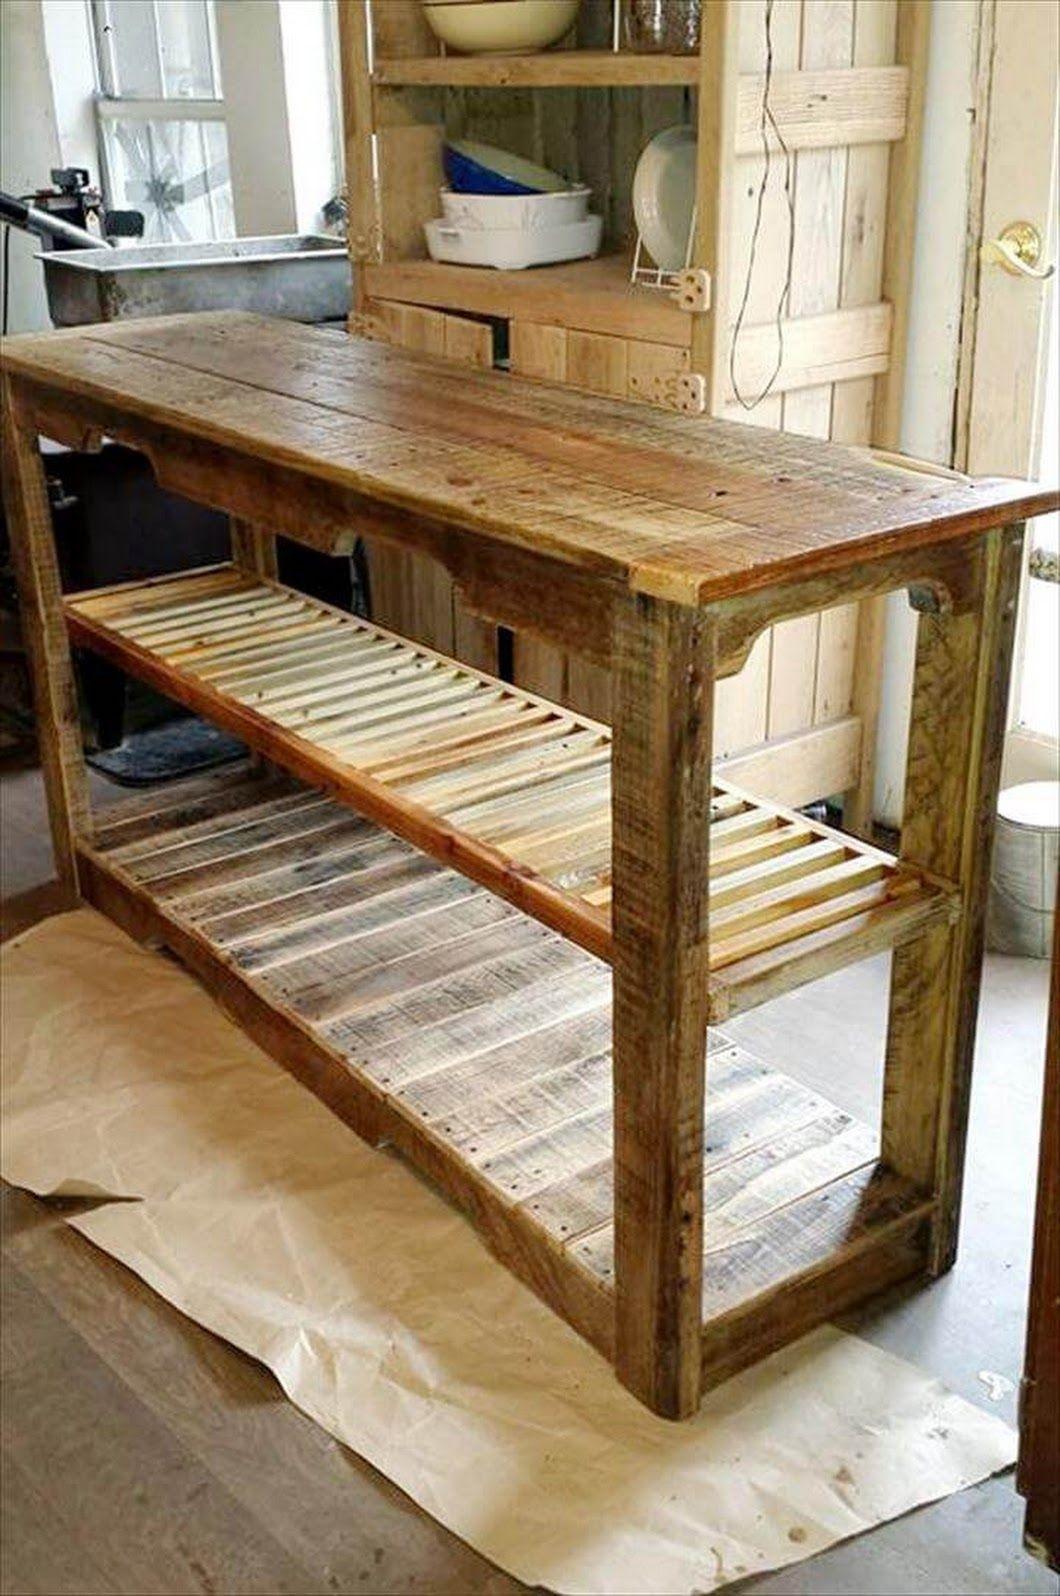 Multipurpose Wooden Pallet Console Table | 99 Pallets ...